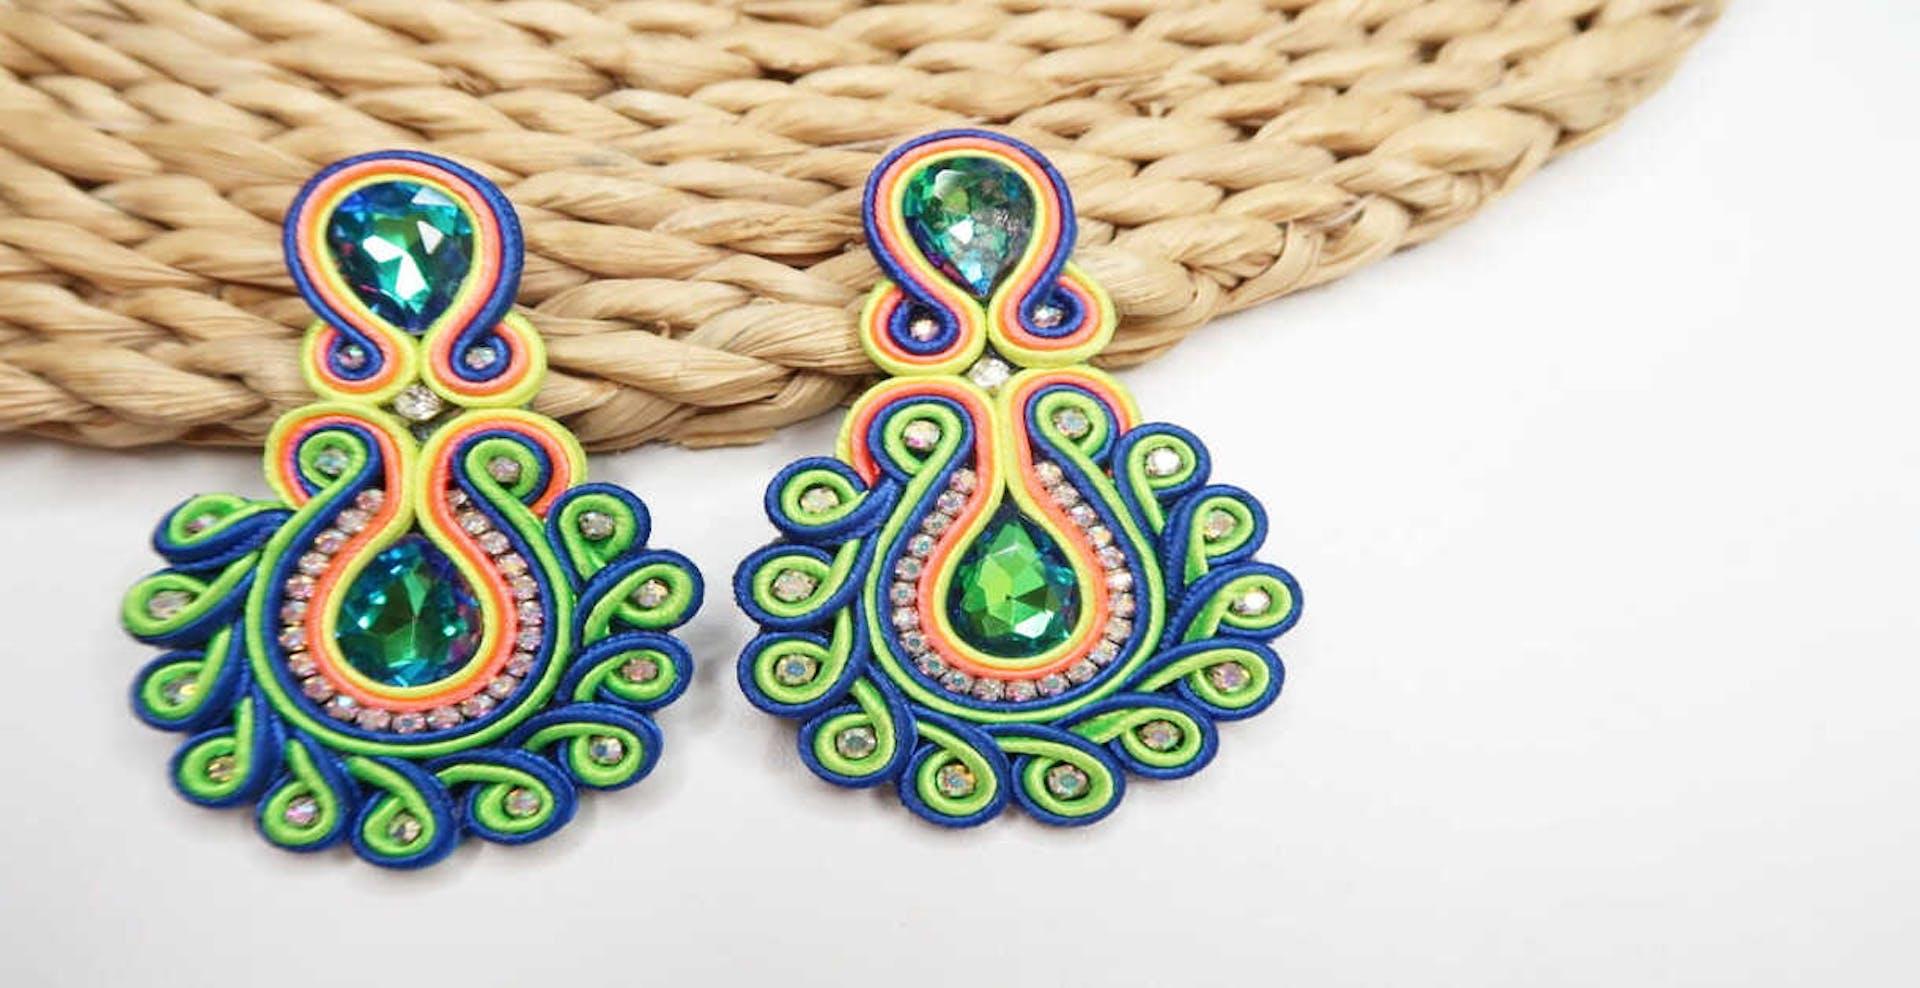 Aretes soutache: dale a tu joyería un toque de elegancia francesa